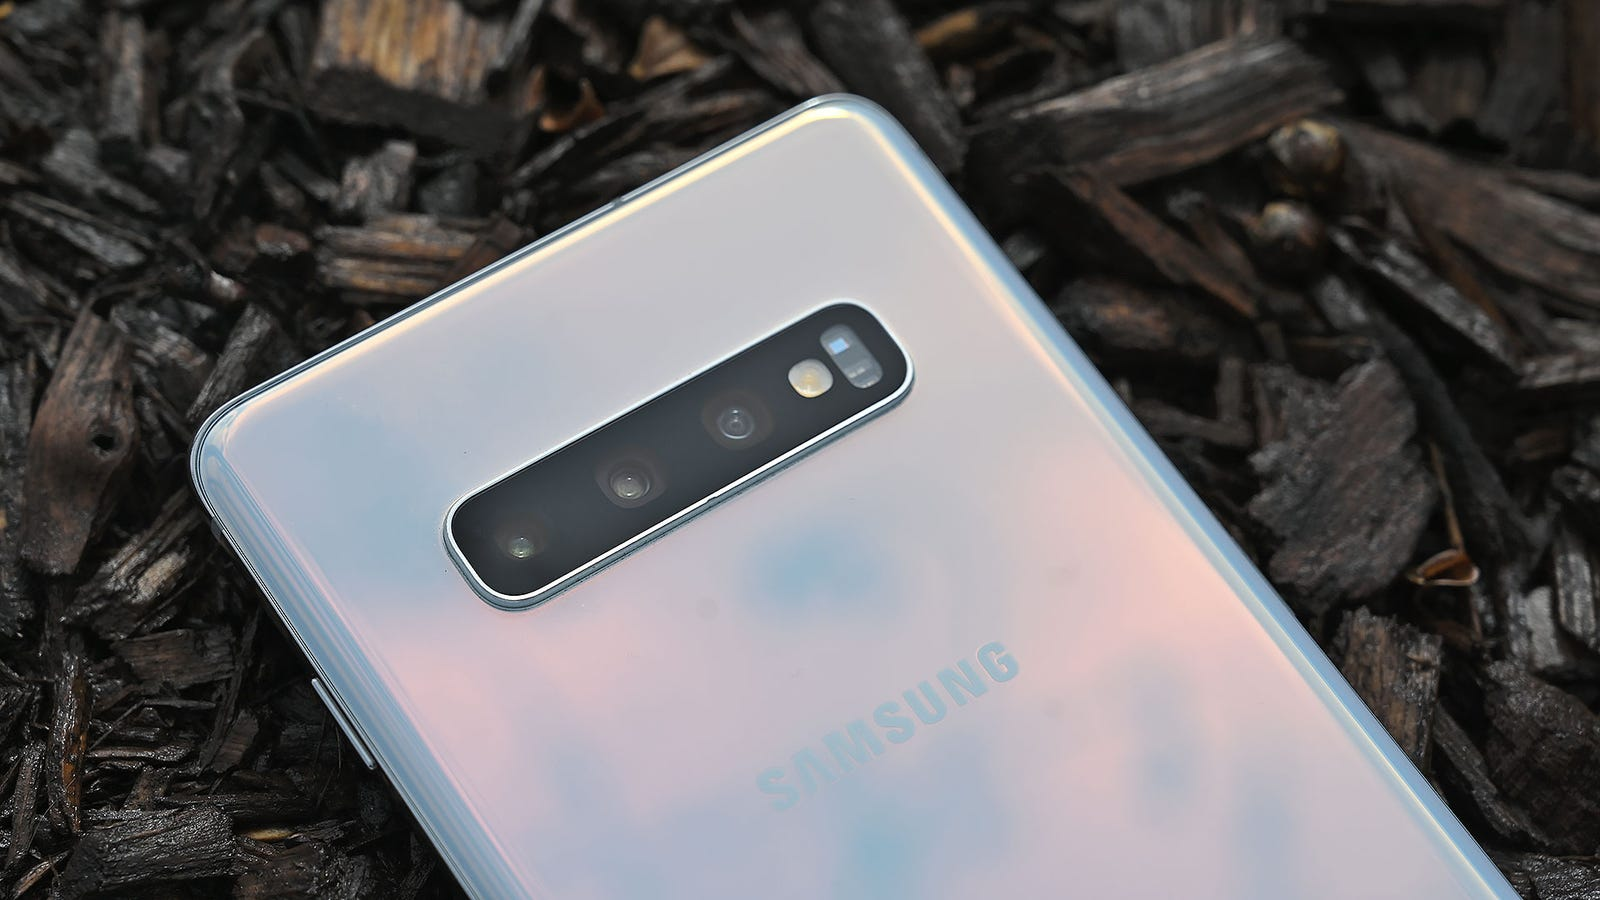 Relax, Samsung's Big Galaxy S10 Bug Won't Affect Aussies